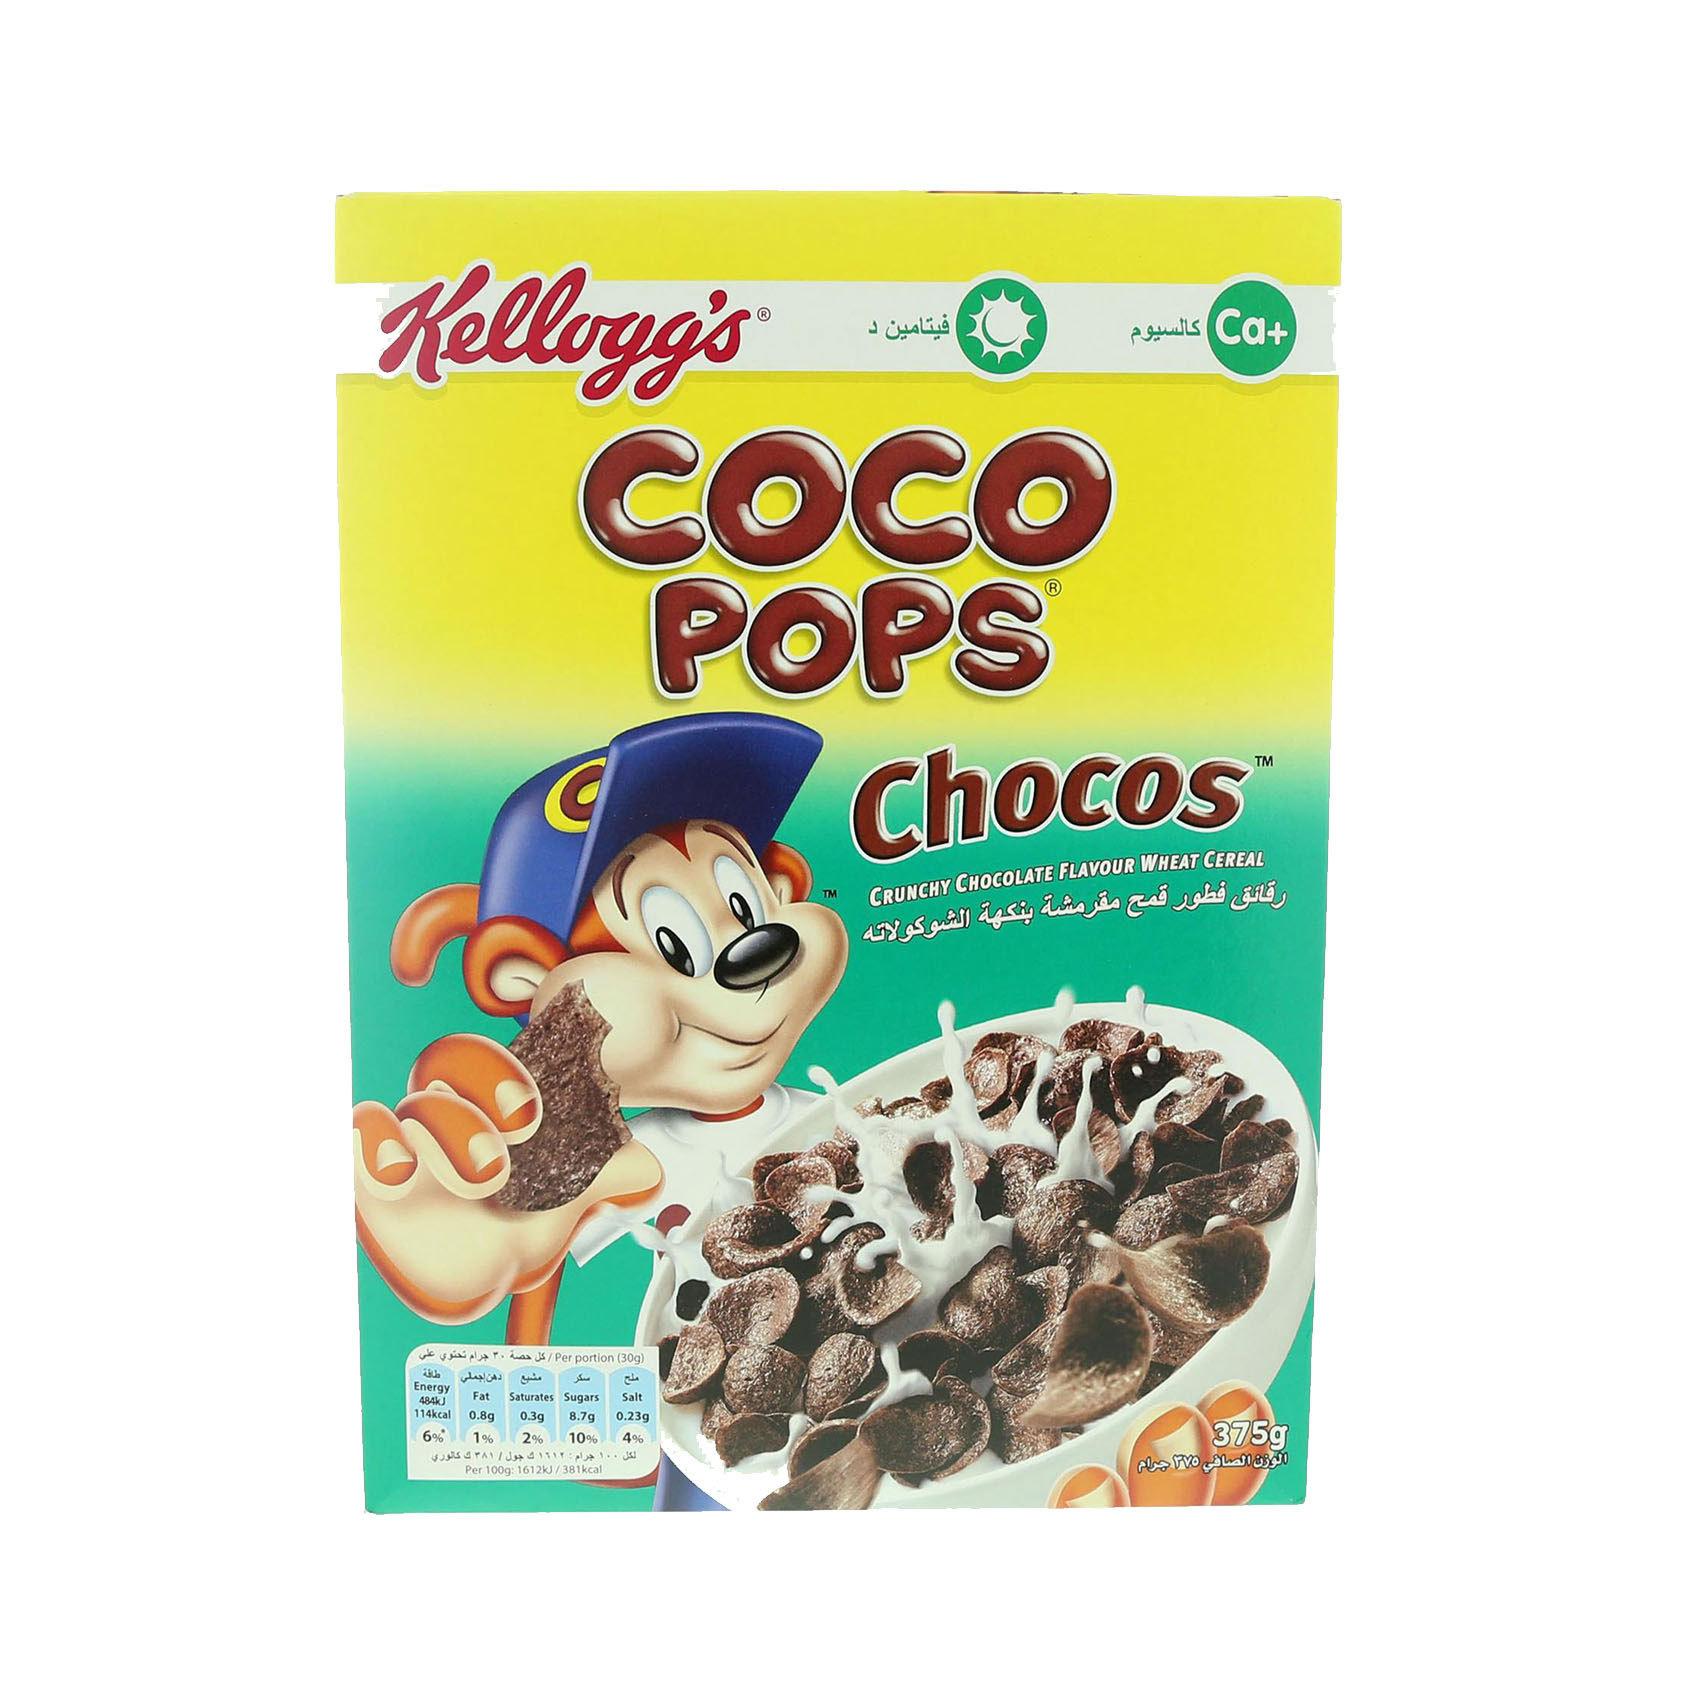 KELLOGG'S COCO POPS CHOCOS 375G